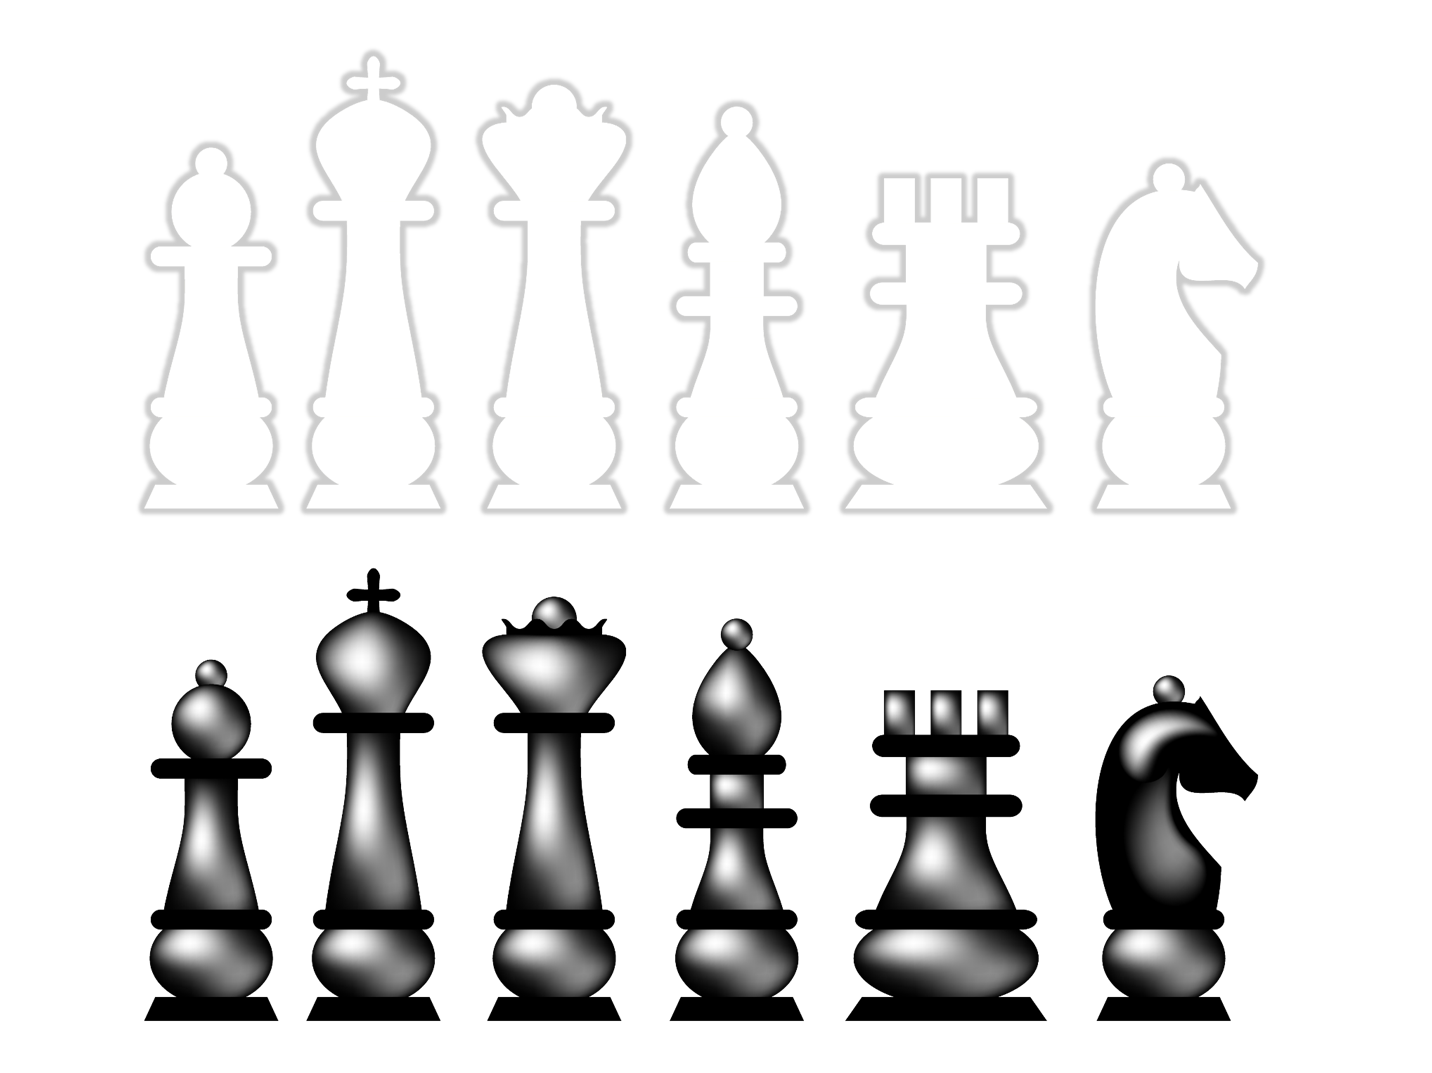 шахматы шаблоны картинки для артефакты делятся классы